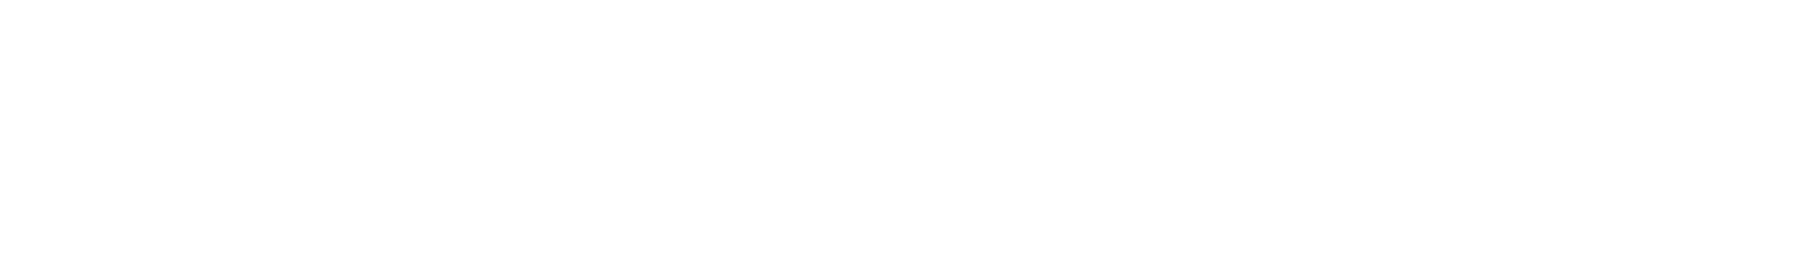 tinny bass